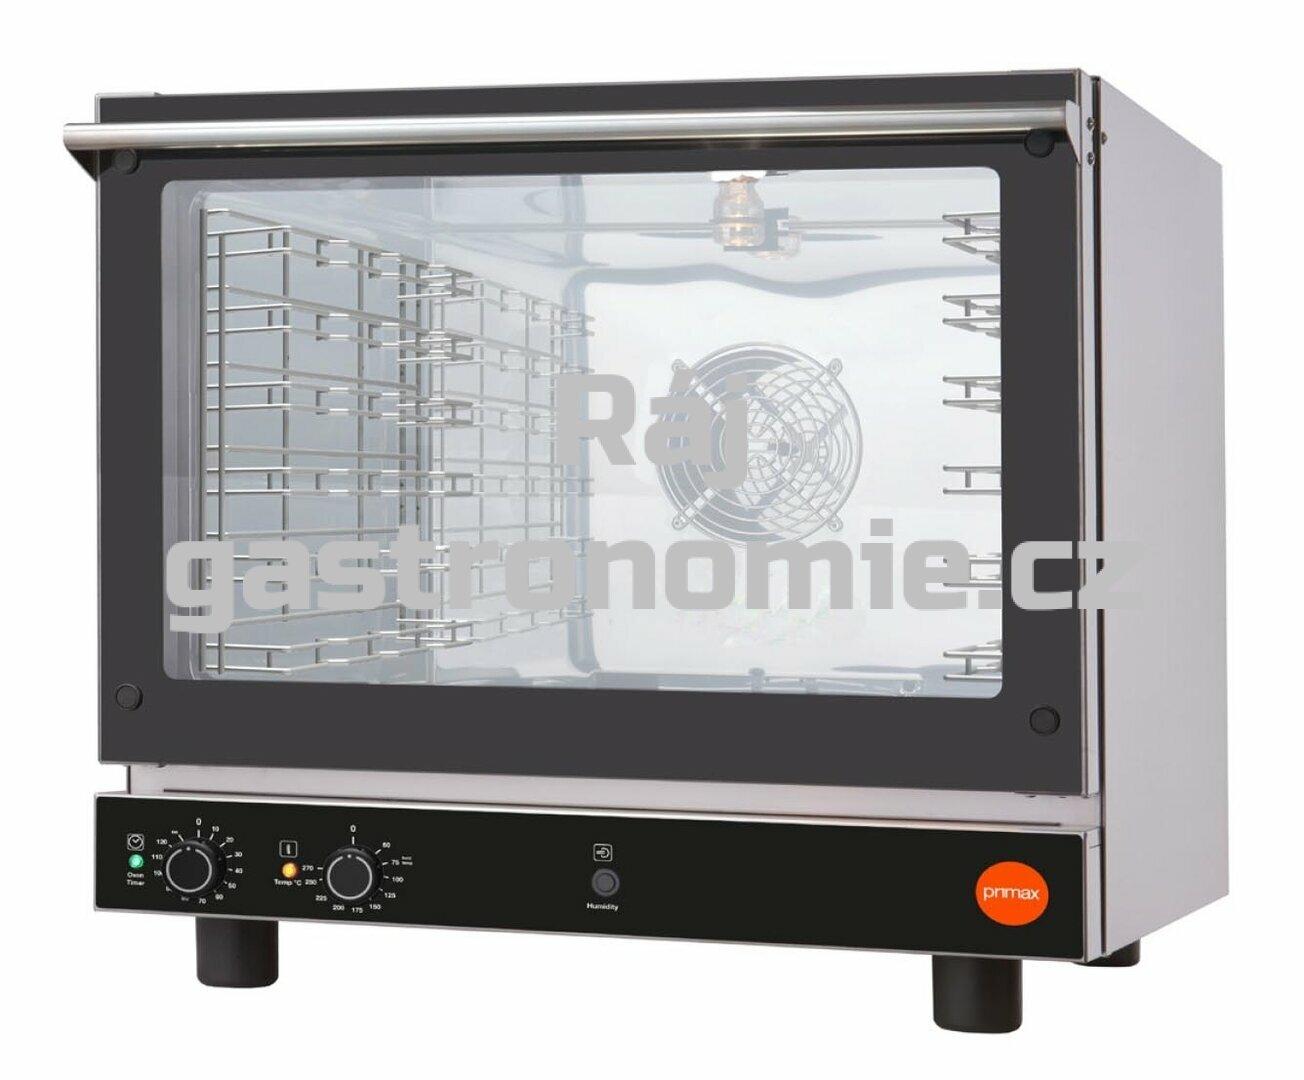 Horkovzdušná pec Primax FV-UME906-HR